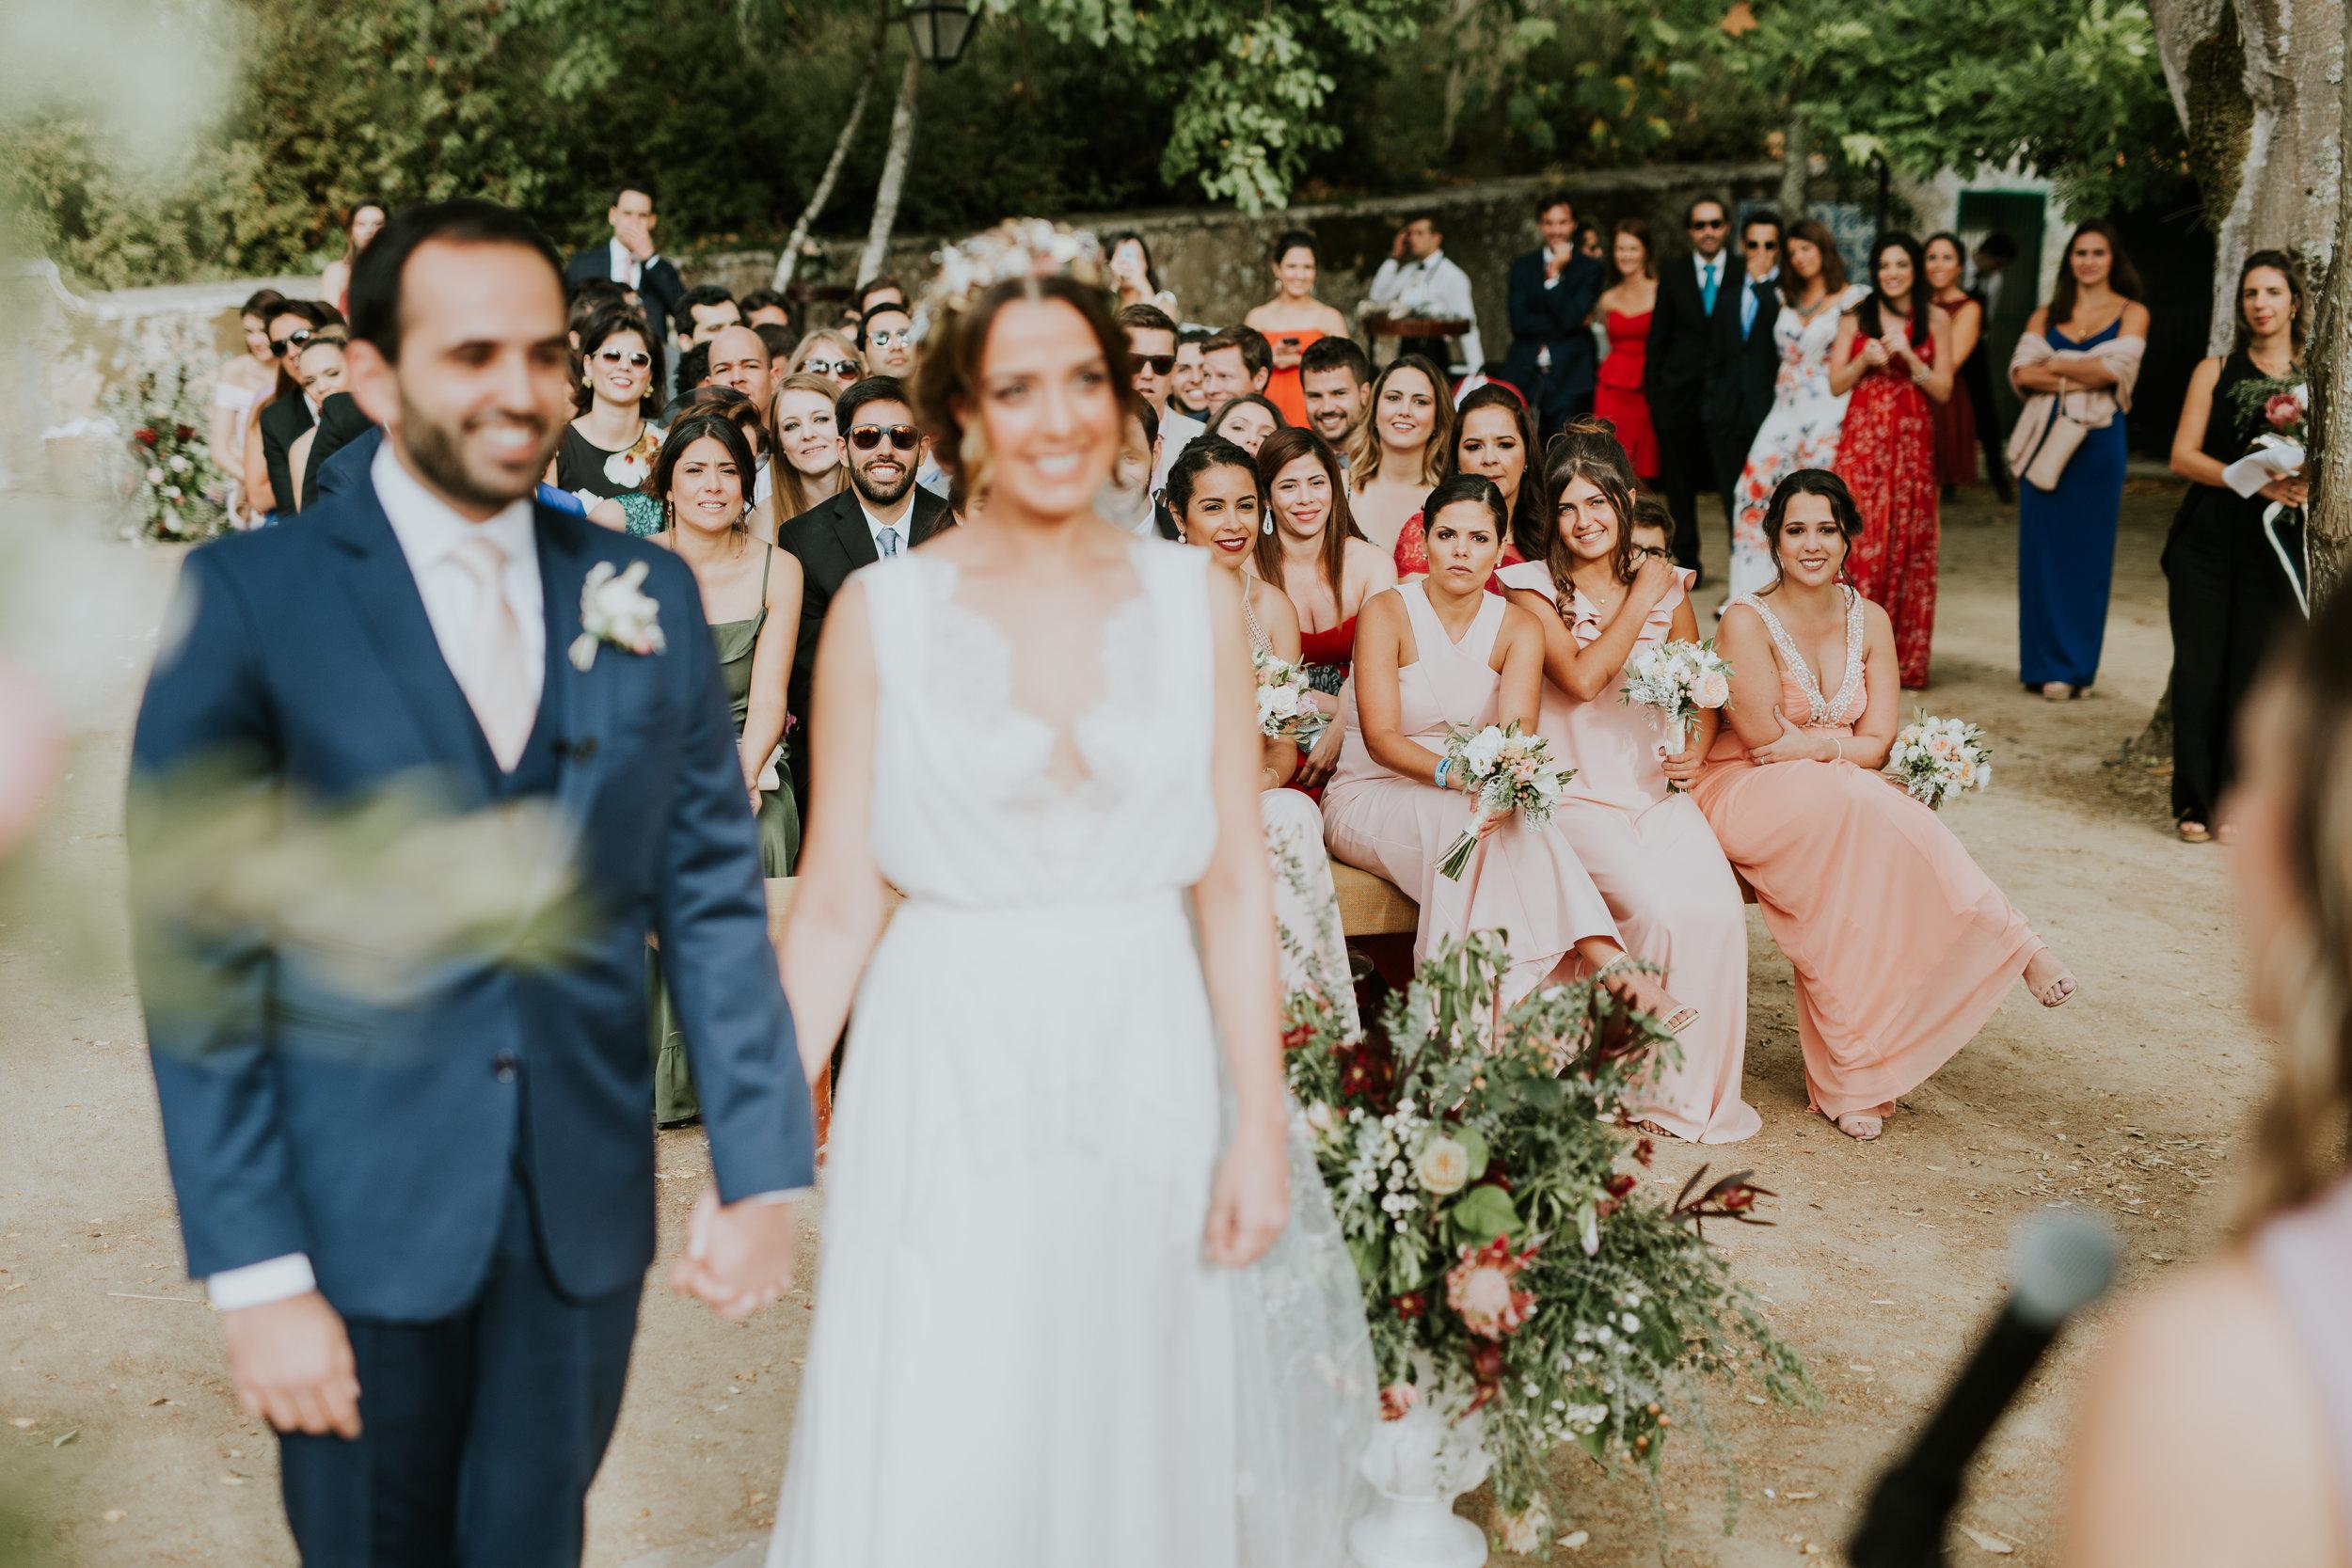 R&J262_ 09 setembro 2017 Wedding day_.jpg